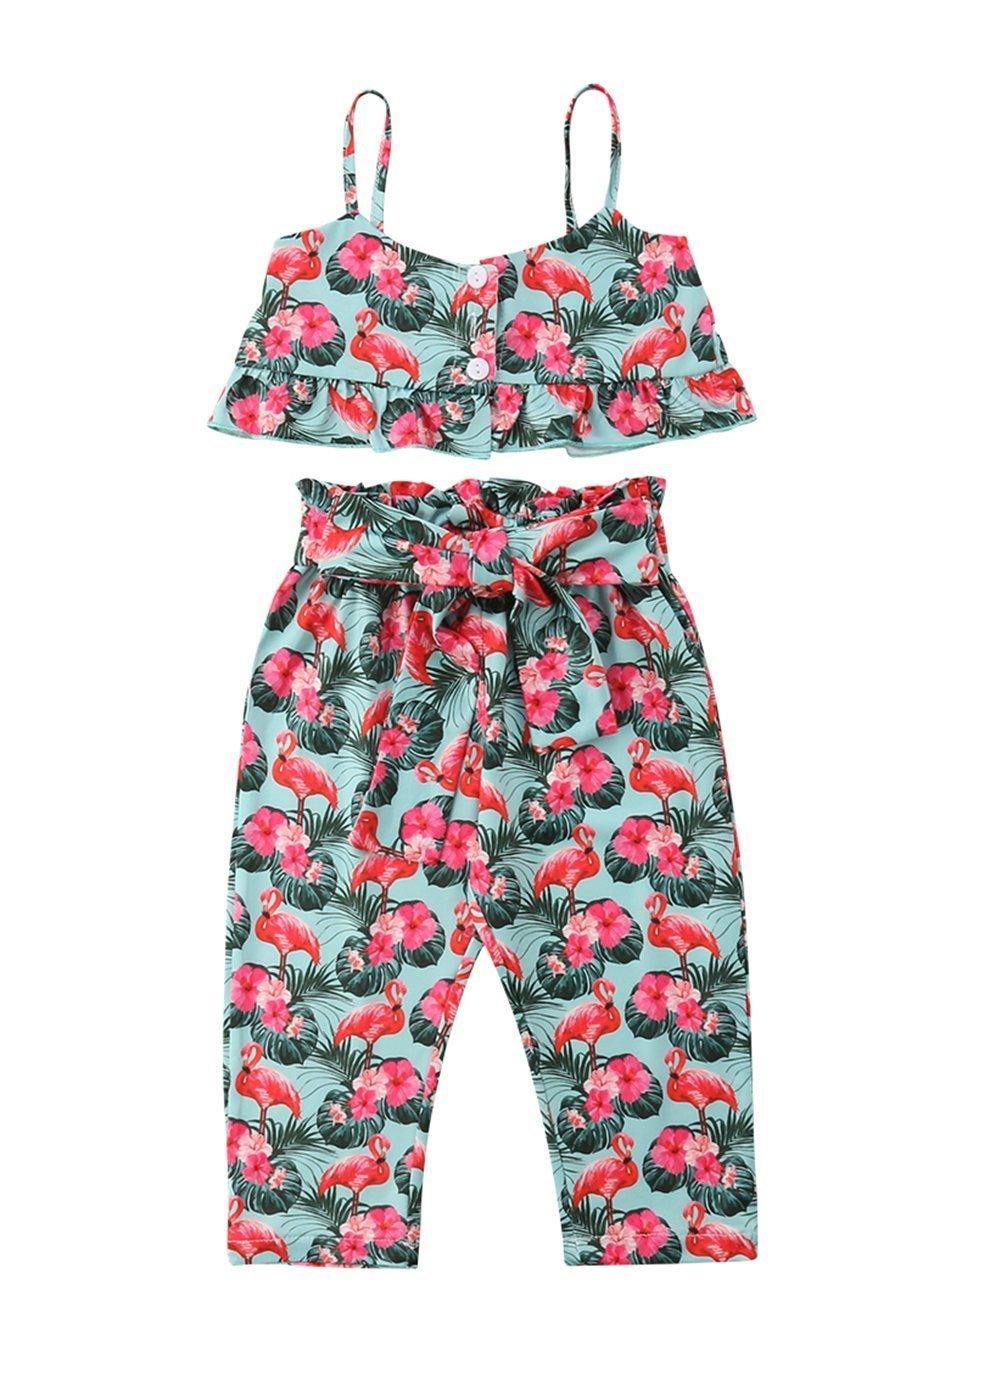 VISGOGO Kids Baby Girls Flamingo Off Shoulder Crop Tops + Pants Outfits Clothes Set 2PCS (1-2 Years)